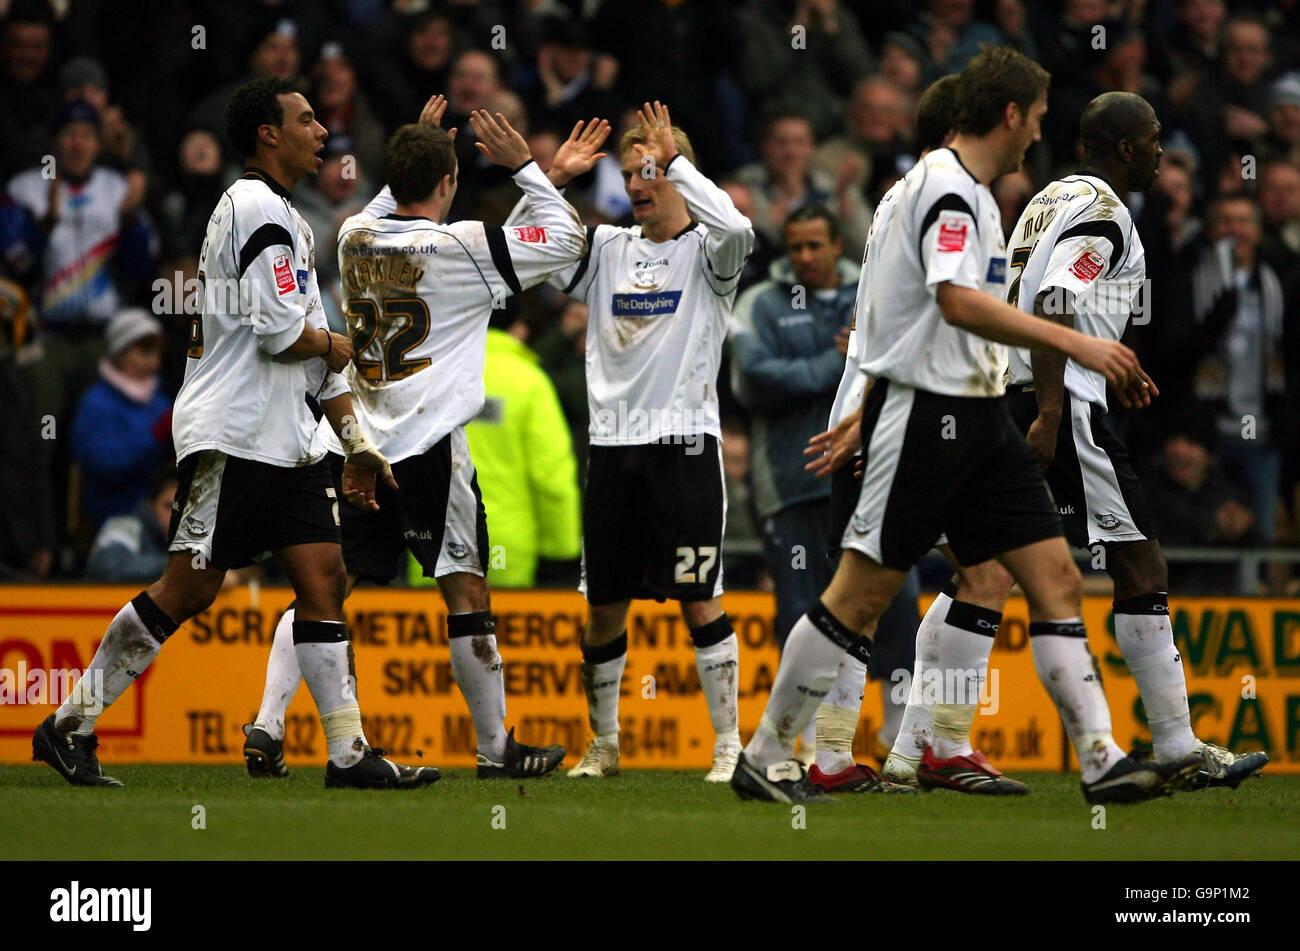 Soccer - Coca-Cola Football Championship - Derby County v Hull City - Pride Park Stock Photo